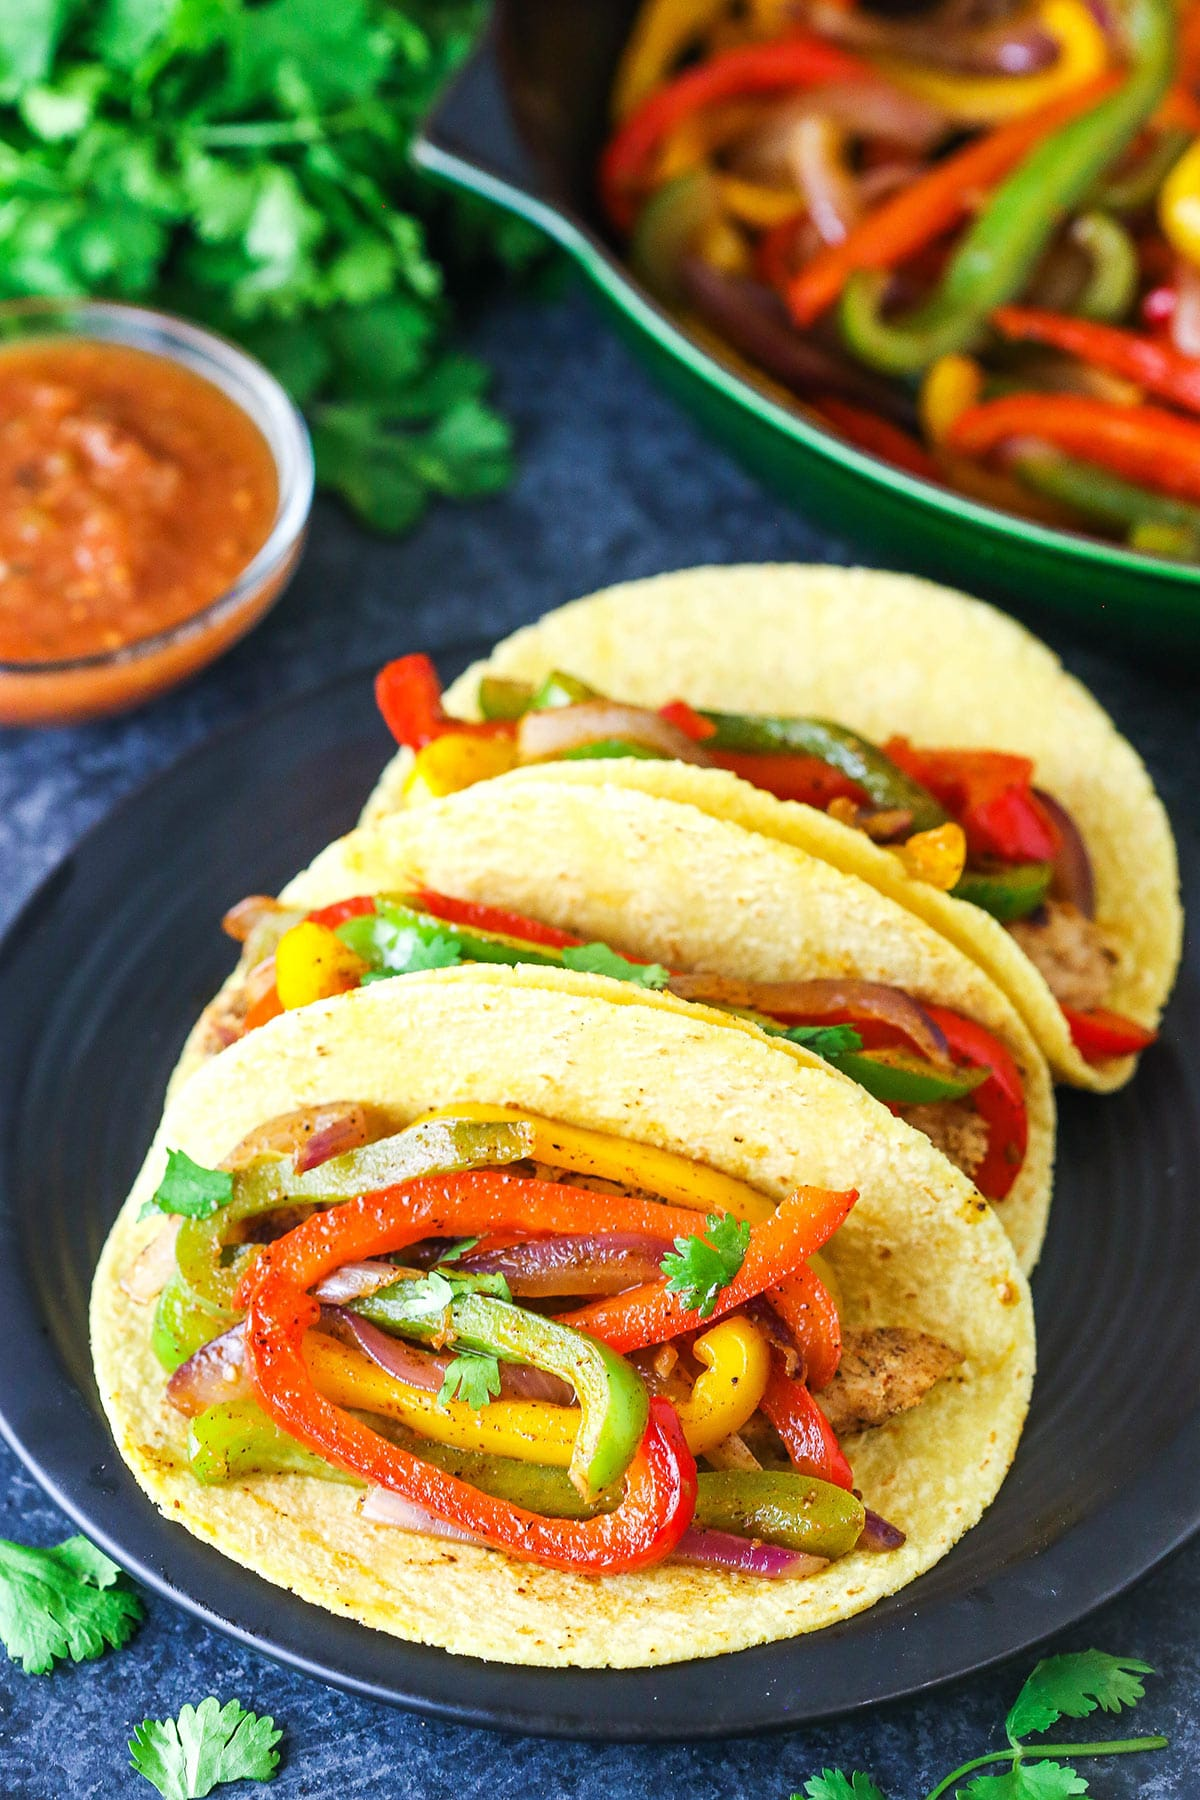 Fajita peppers and onions in a taco